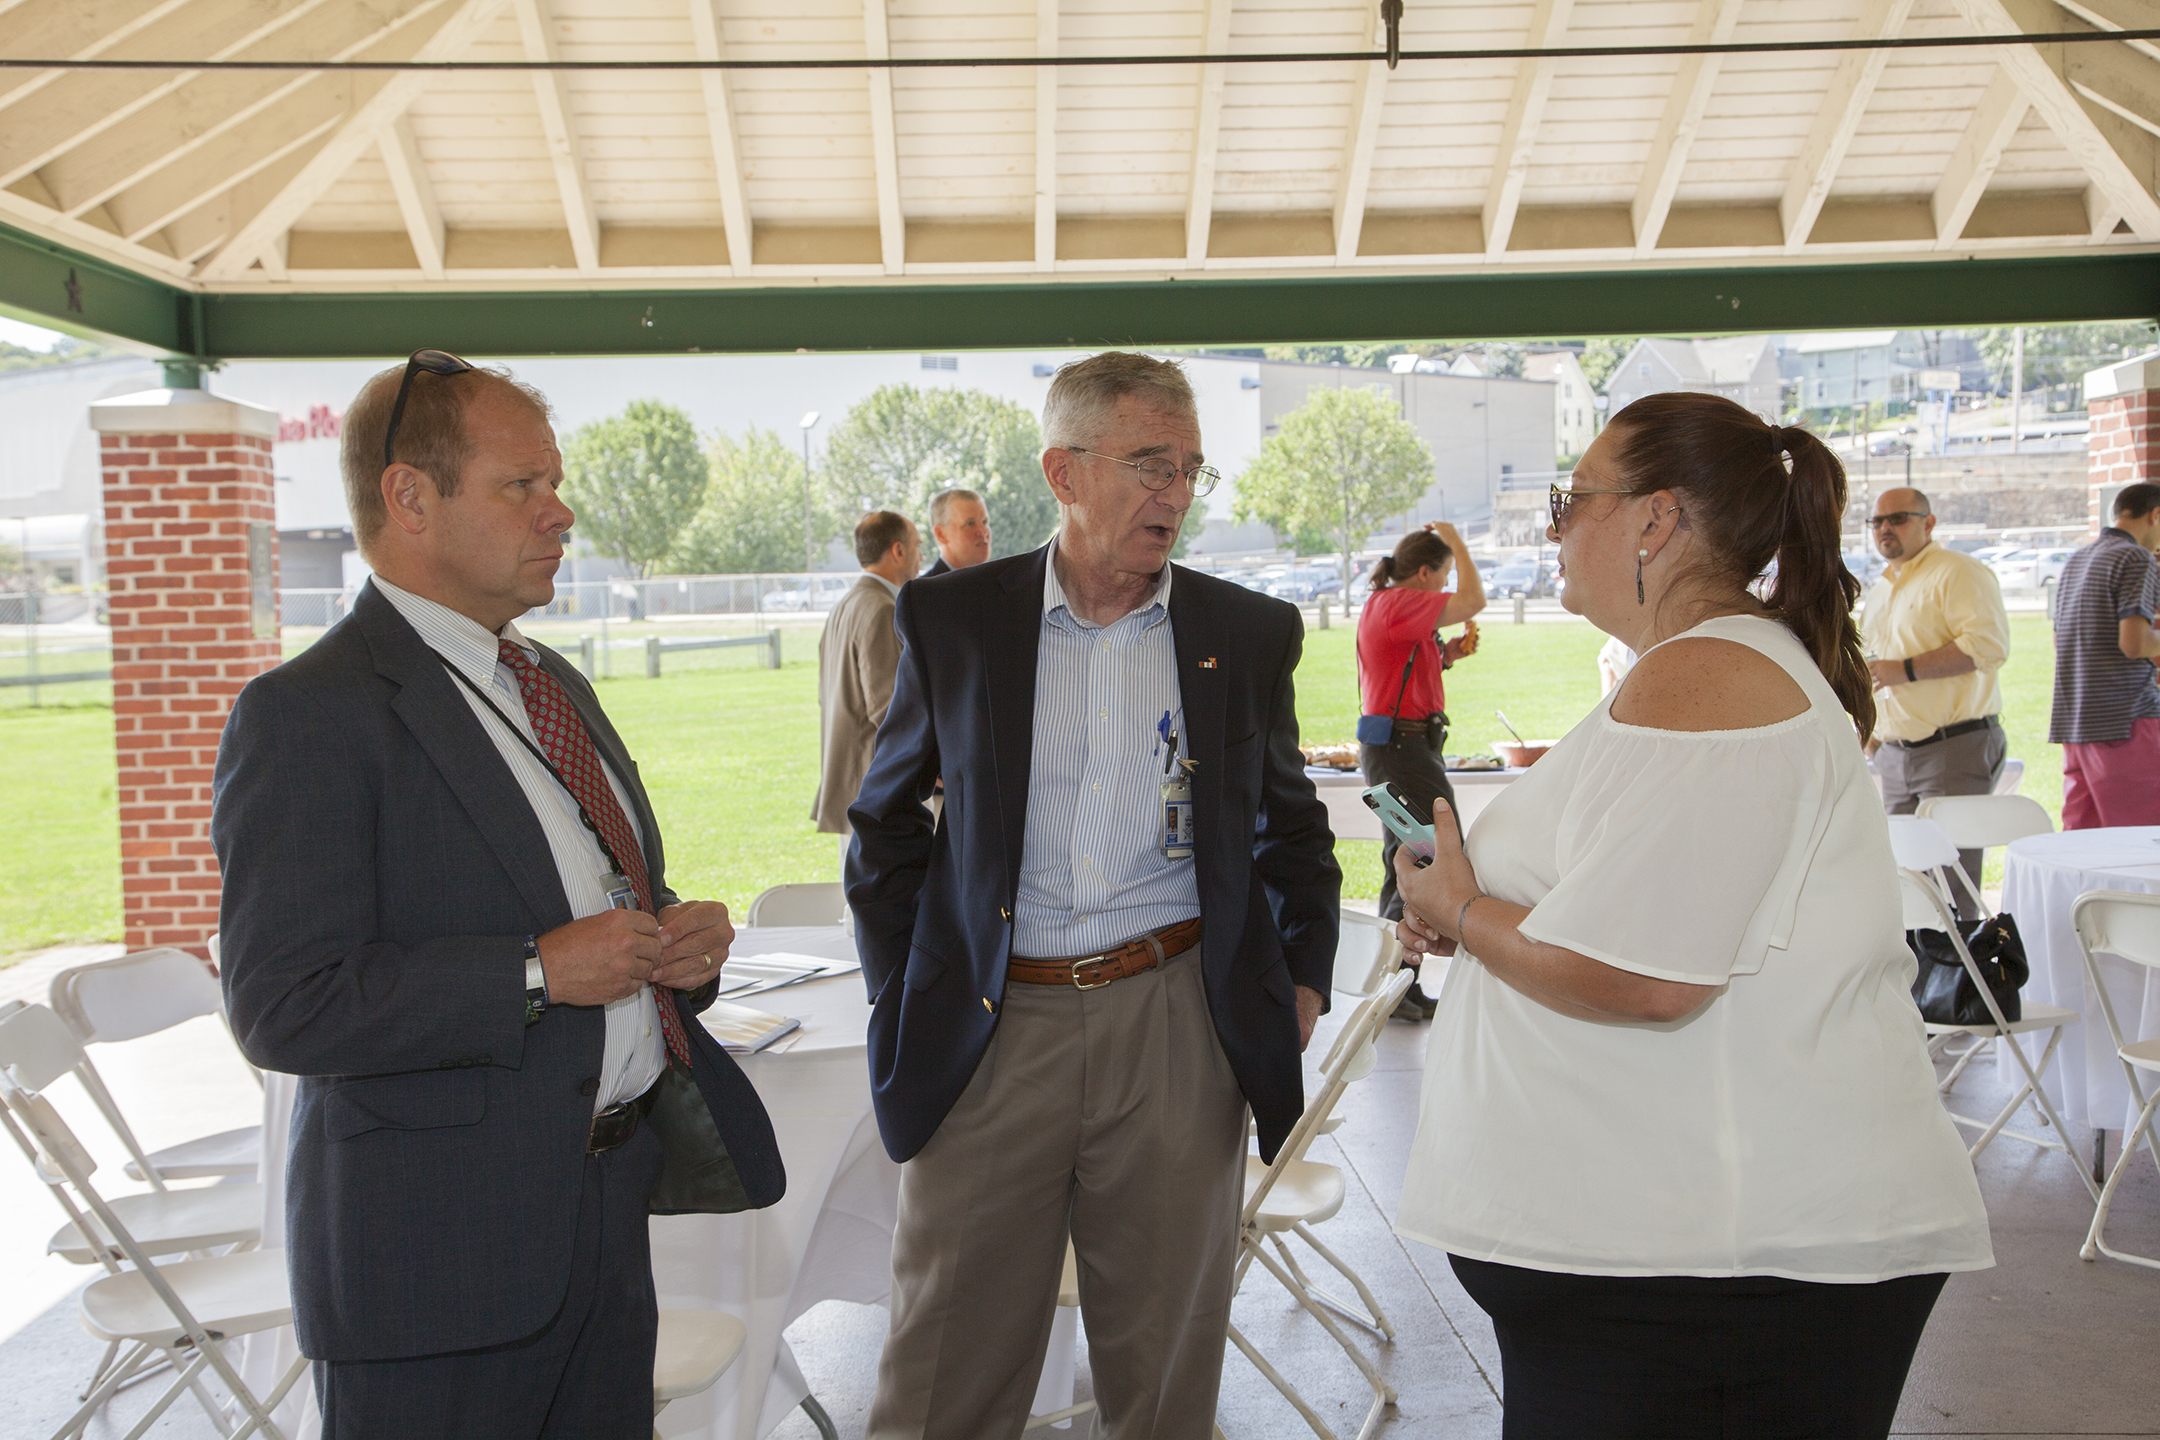 EPA Press Event - Aug. 23, 2017